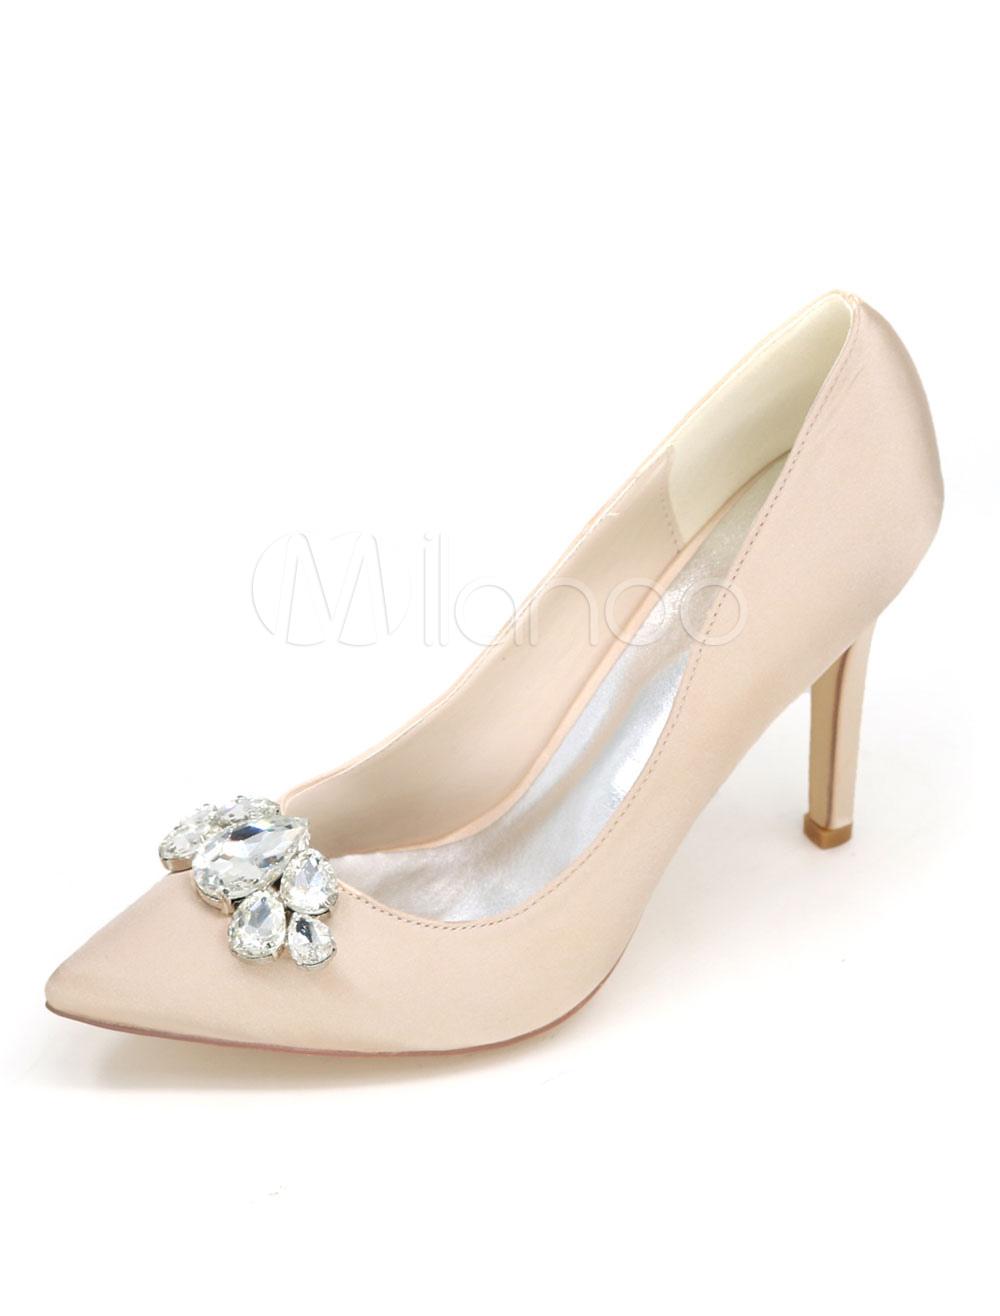 Zapatos de tacón de stiletto de puntera puntiaguada de satén elegantes para boda WuIImQNAq